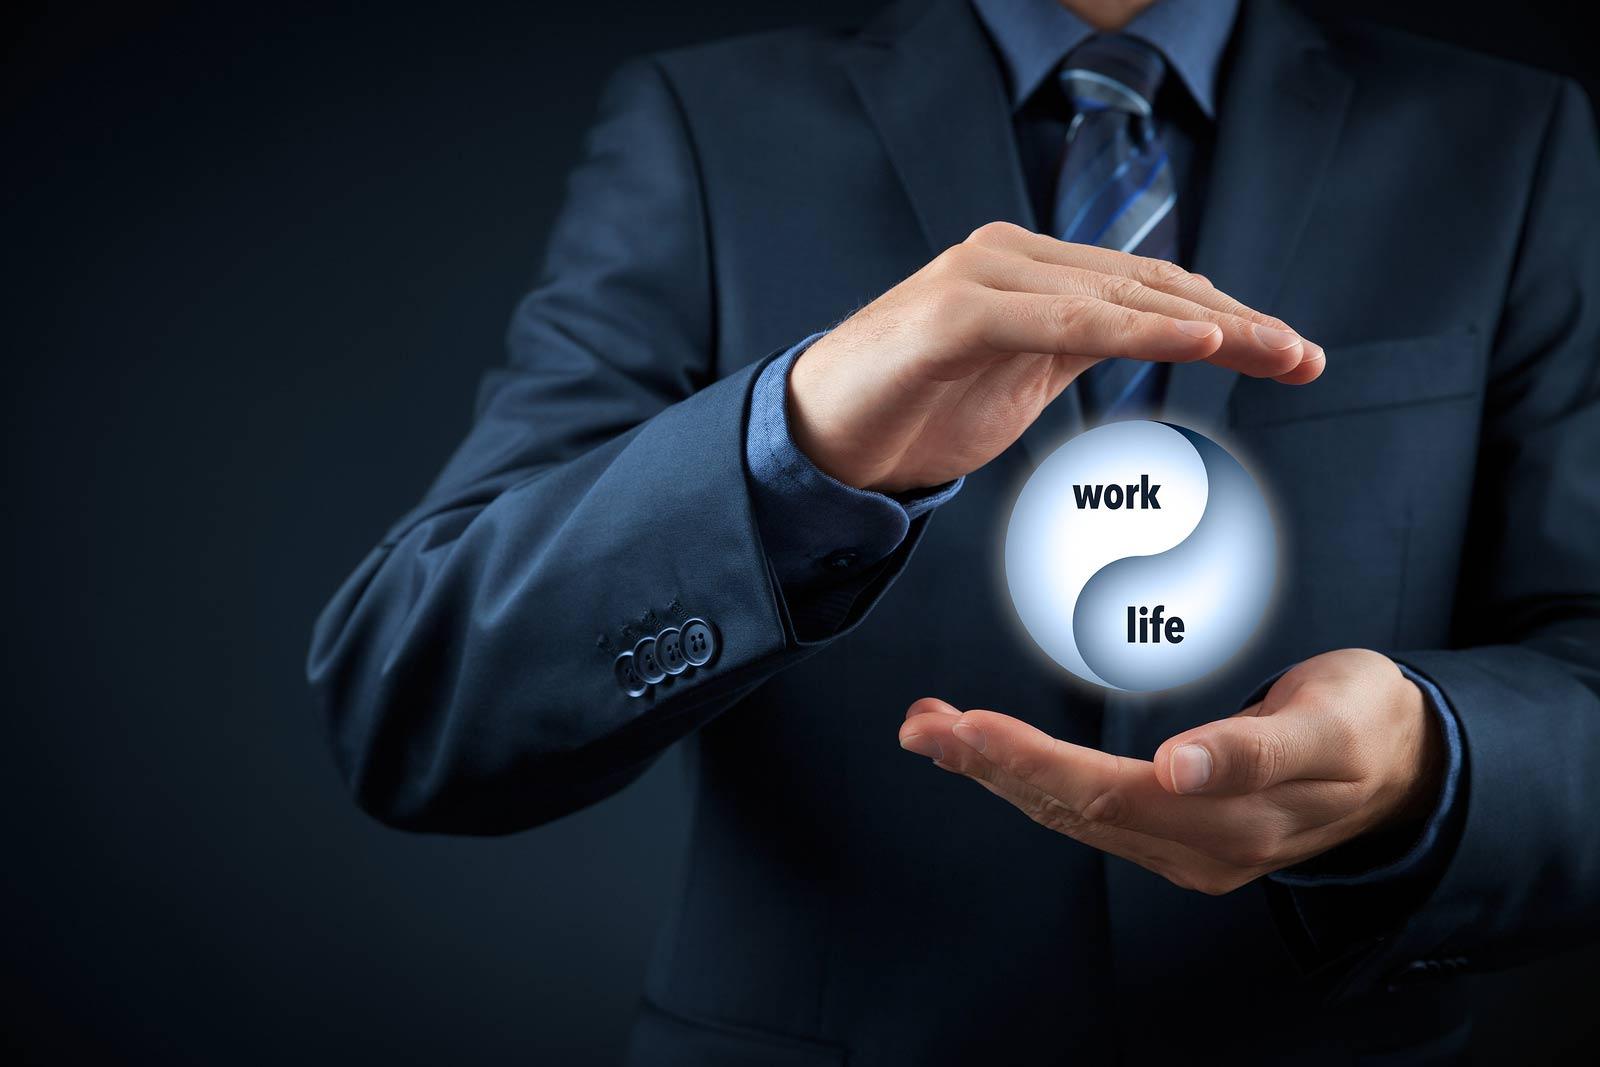 Man holding digital work life ball